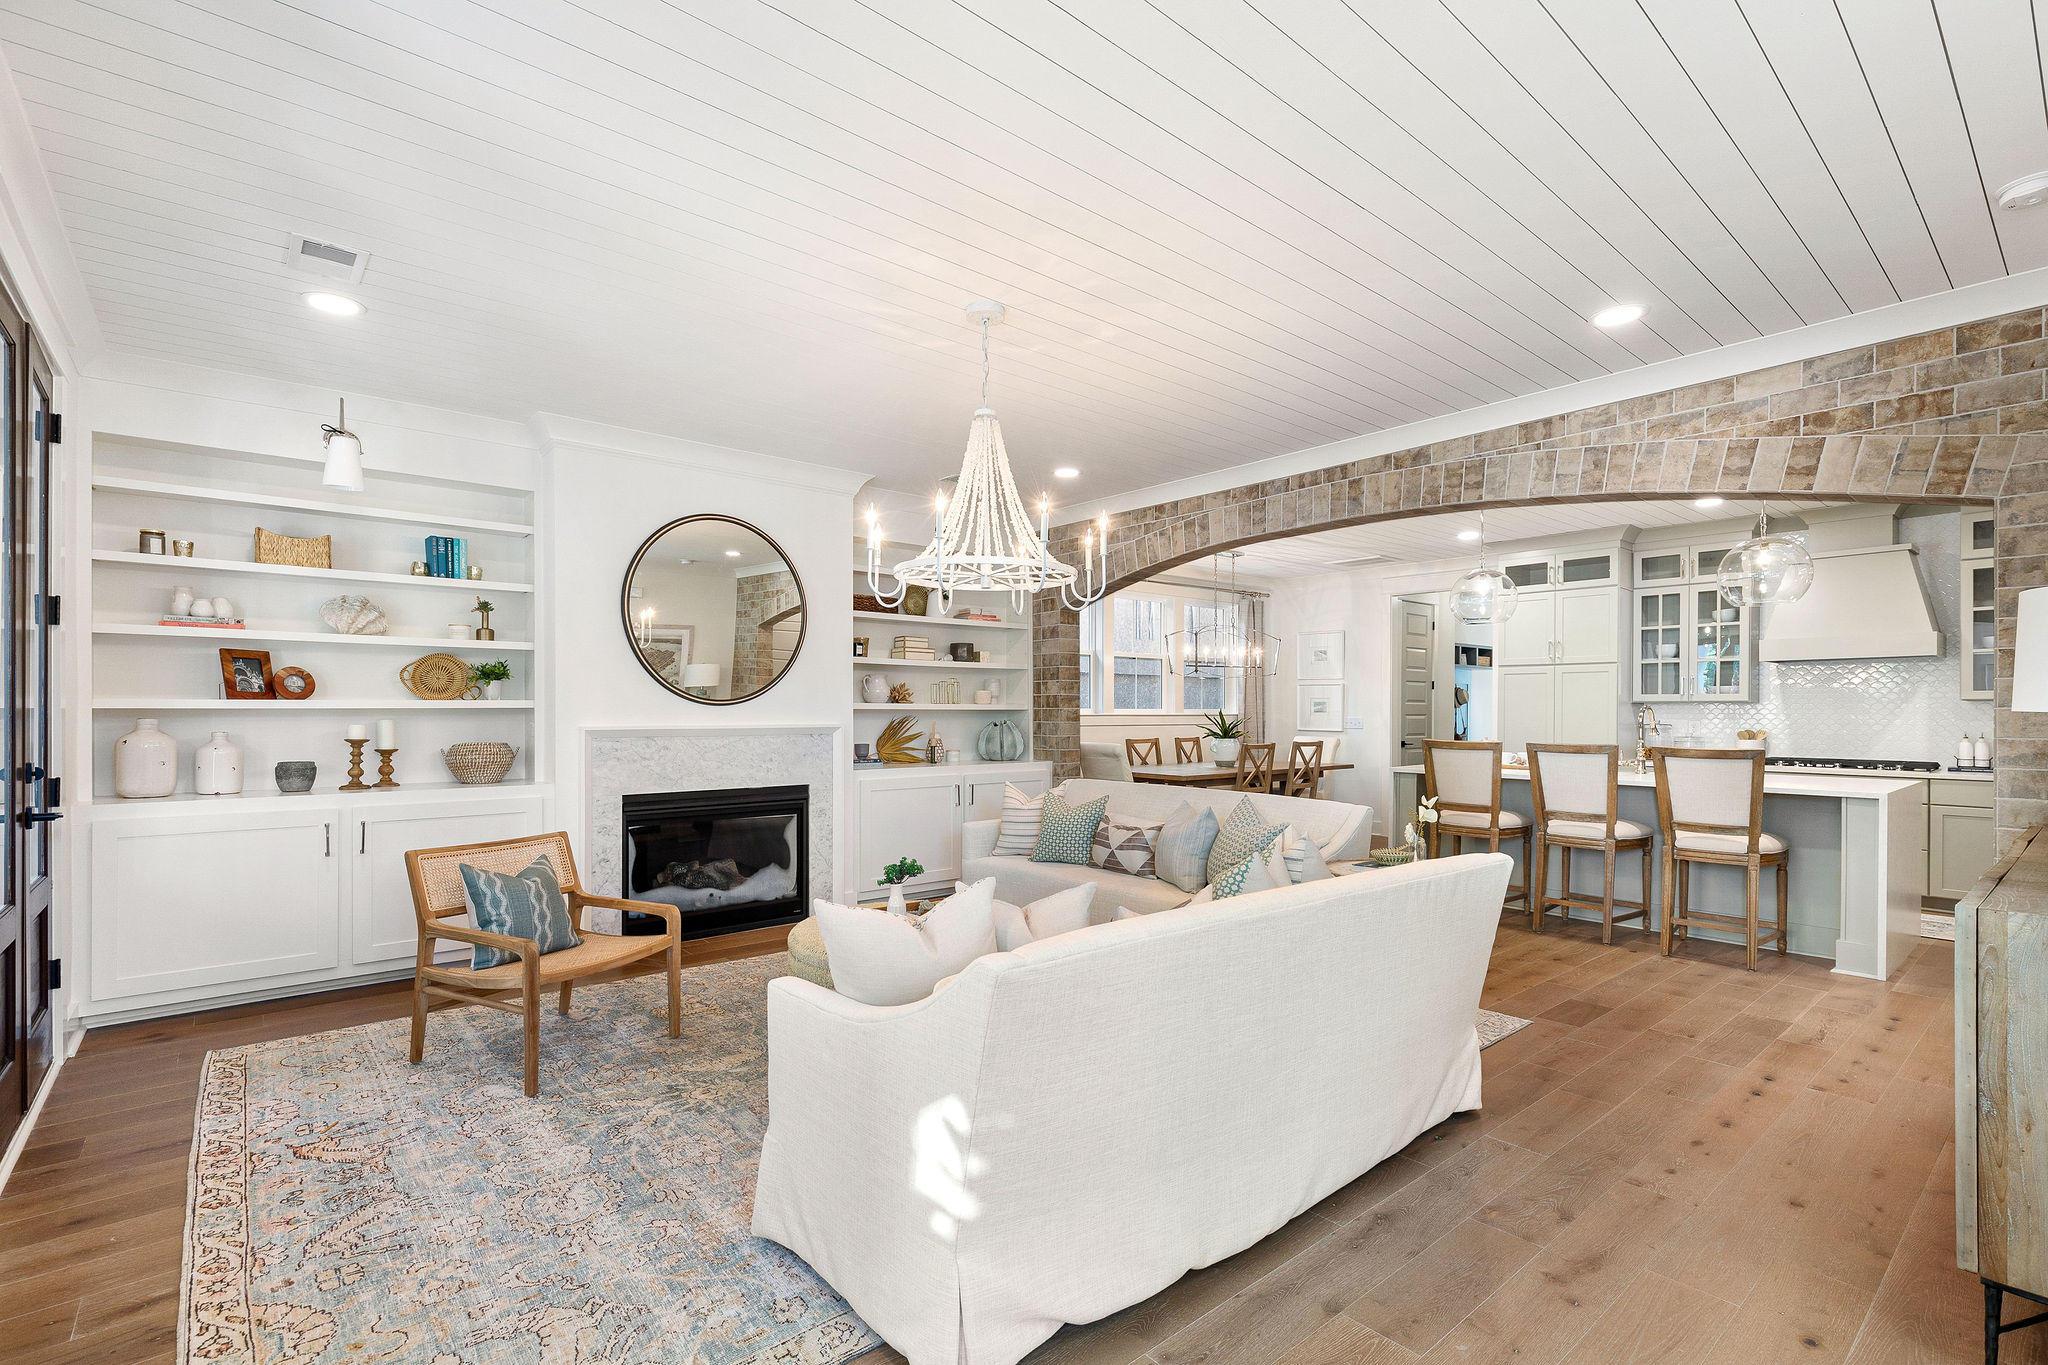 Avenue of Oaks Homes For Sale - 1027 Avenue Of Oaks, Charleston, SC - 43